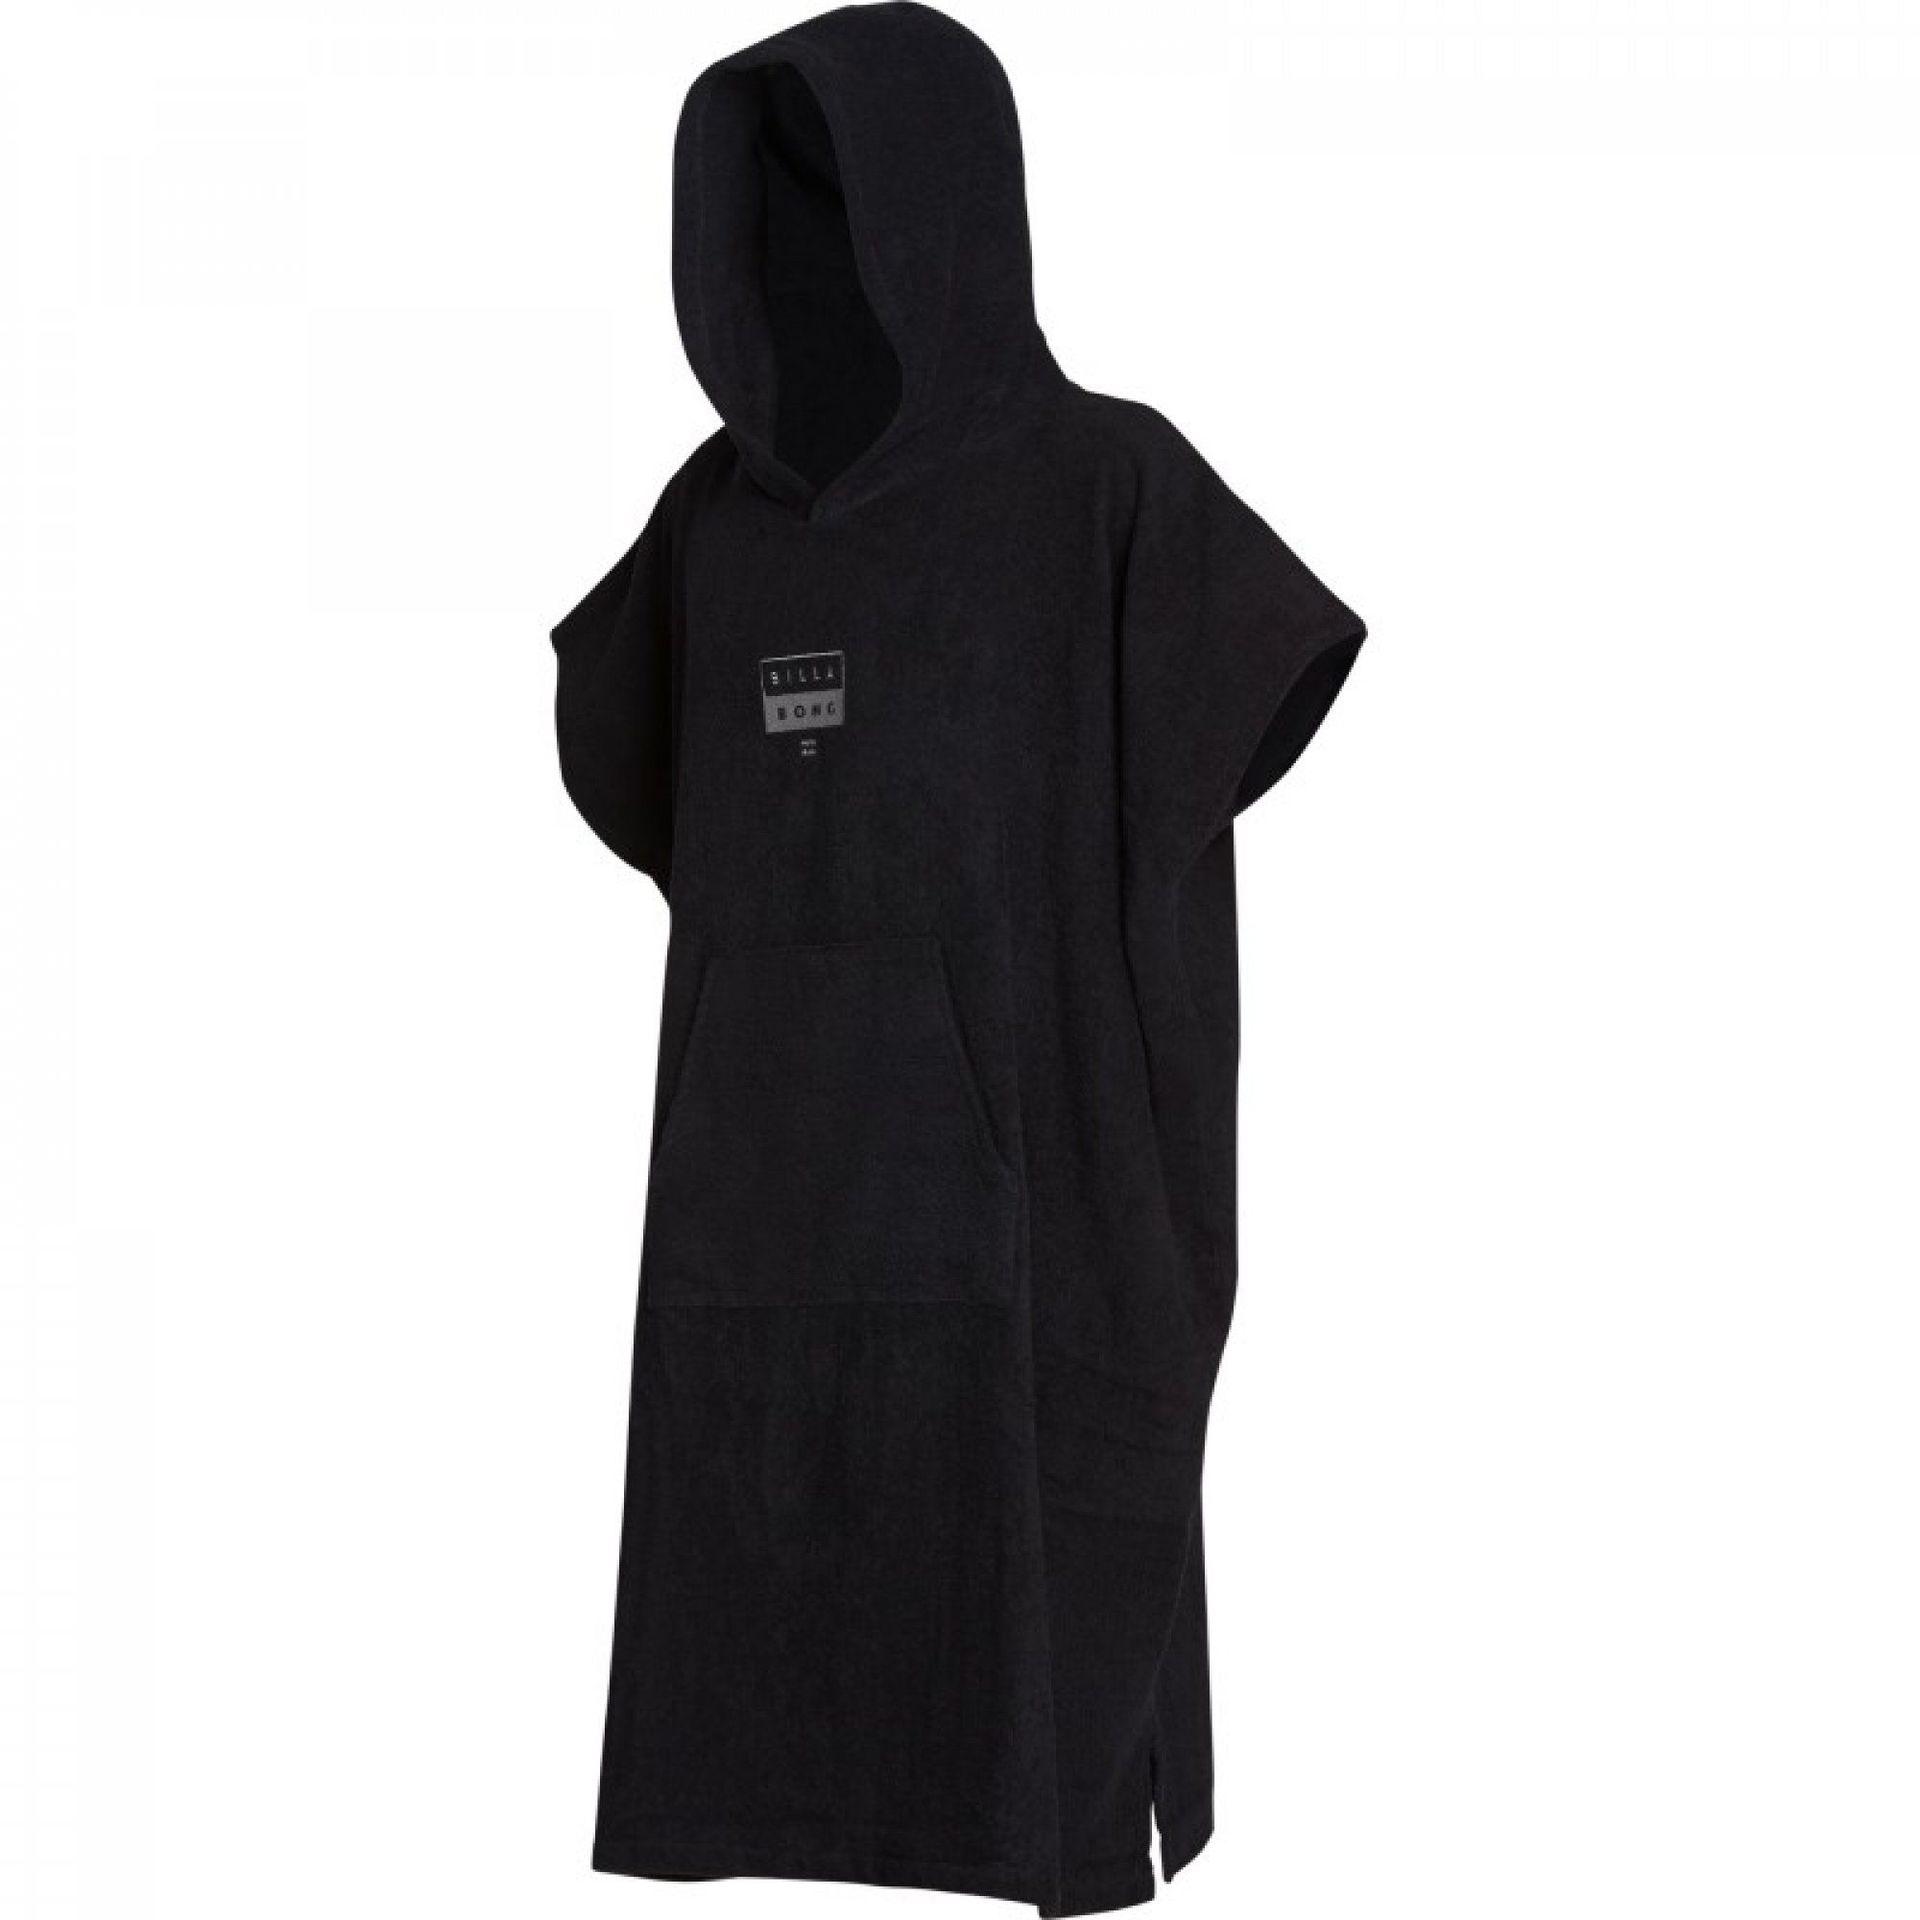 PONCHO BILLABONG HOODIE TOWEL BLACK